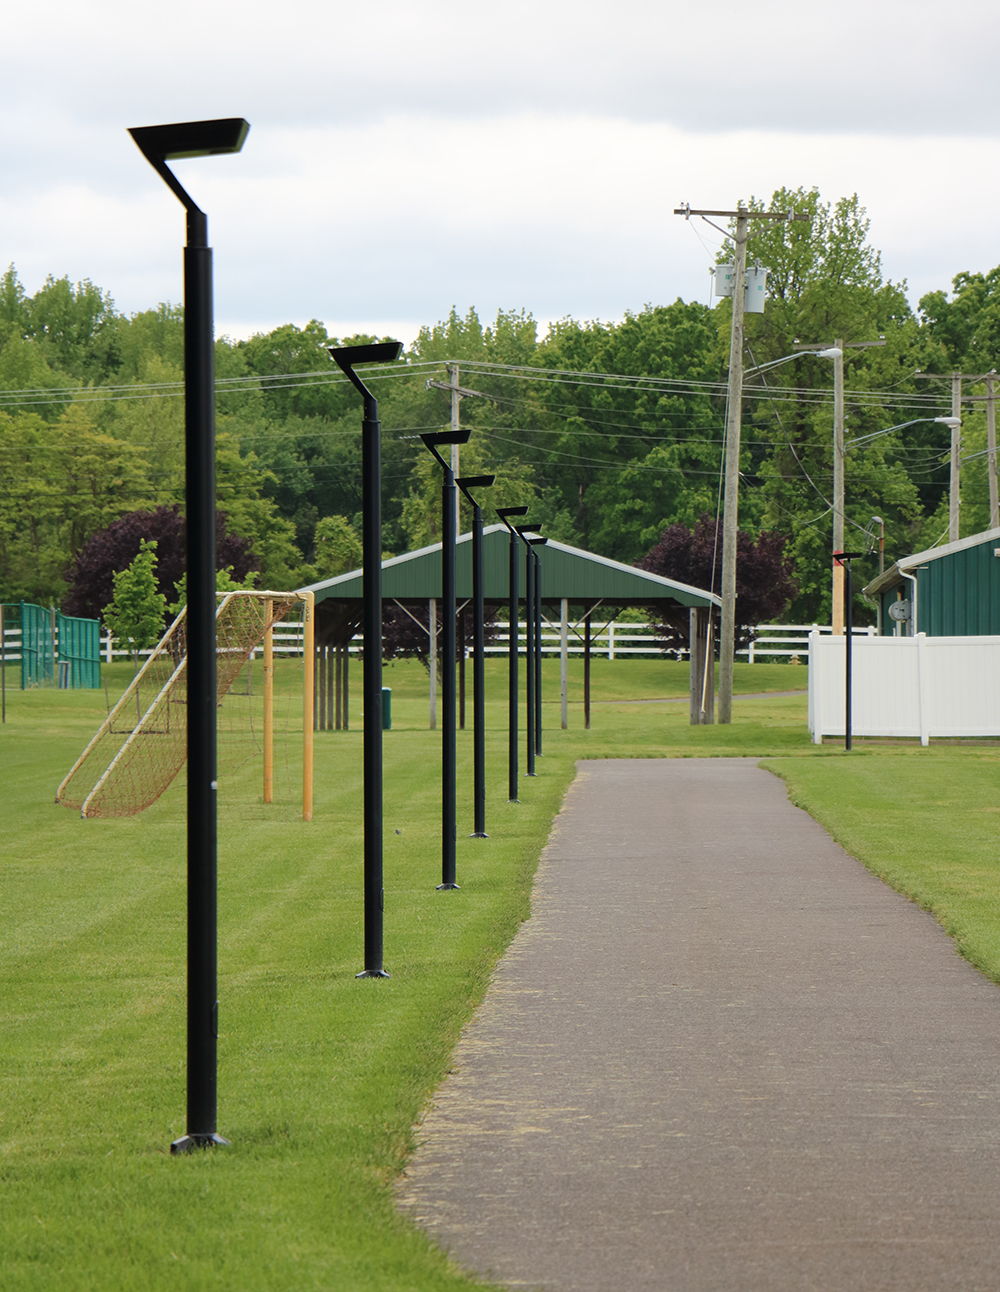 Pathway Lighting Luminaires - IPL Series - First Light Technologies